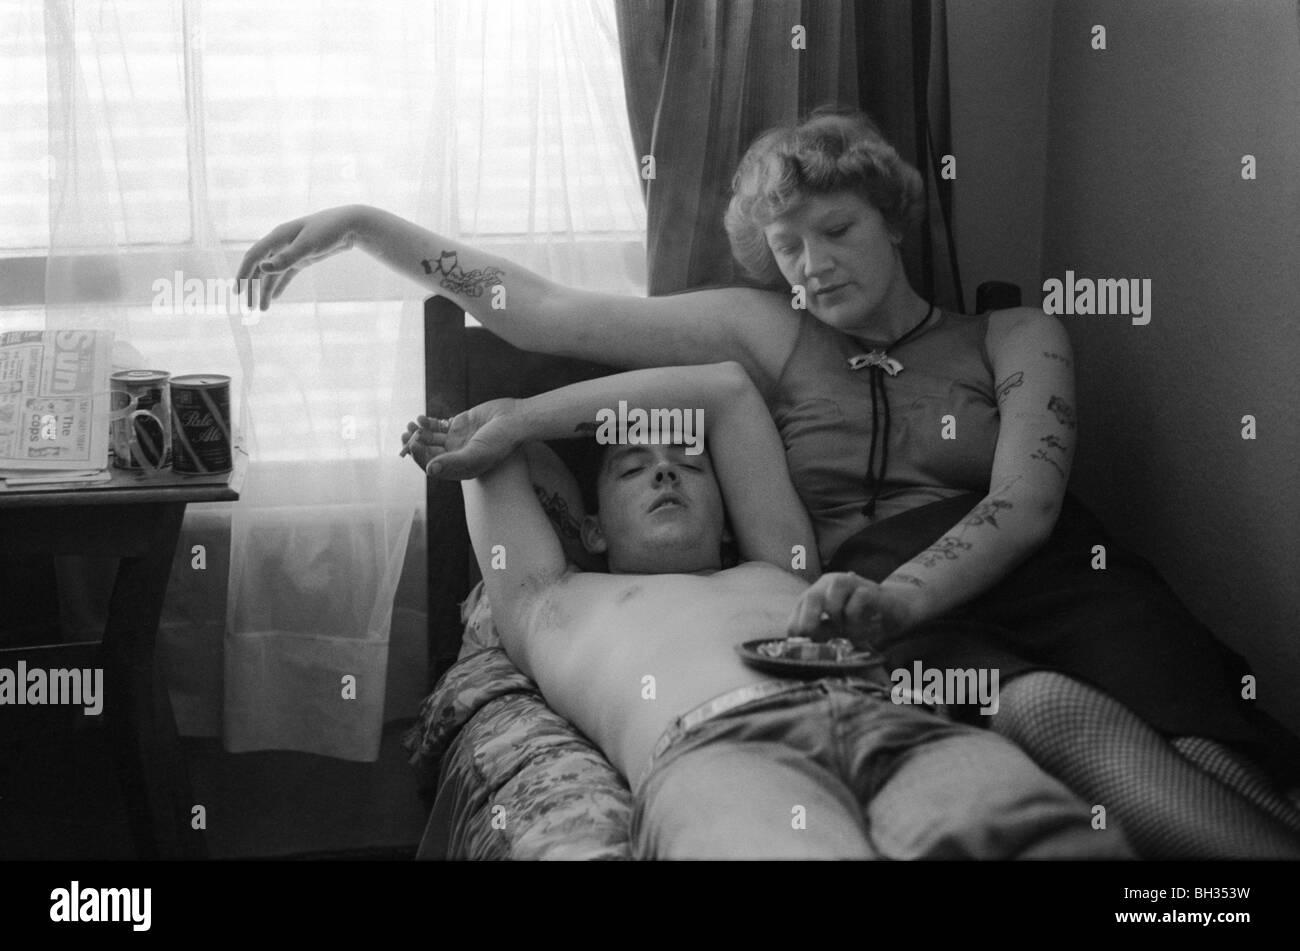 Couple Earls Court bedsit London UK 1977  'HOMER SYKES' - Stock Image